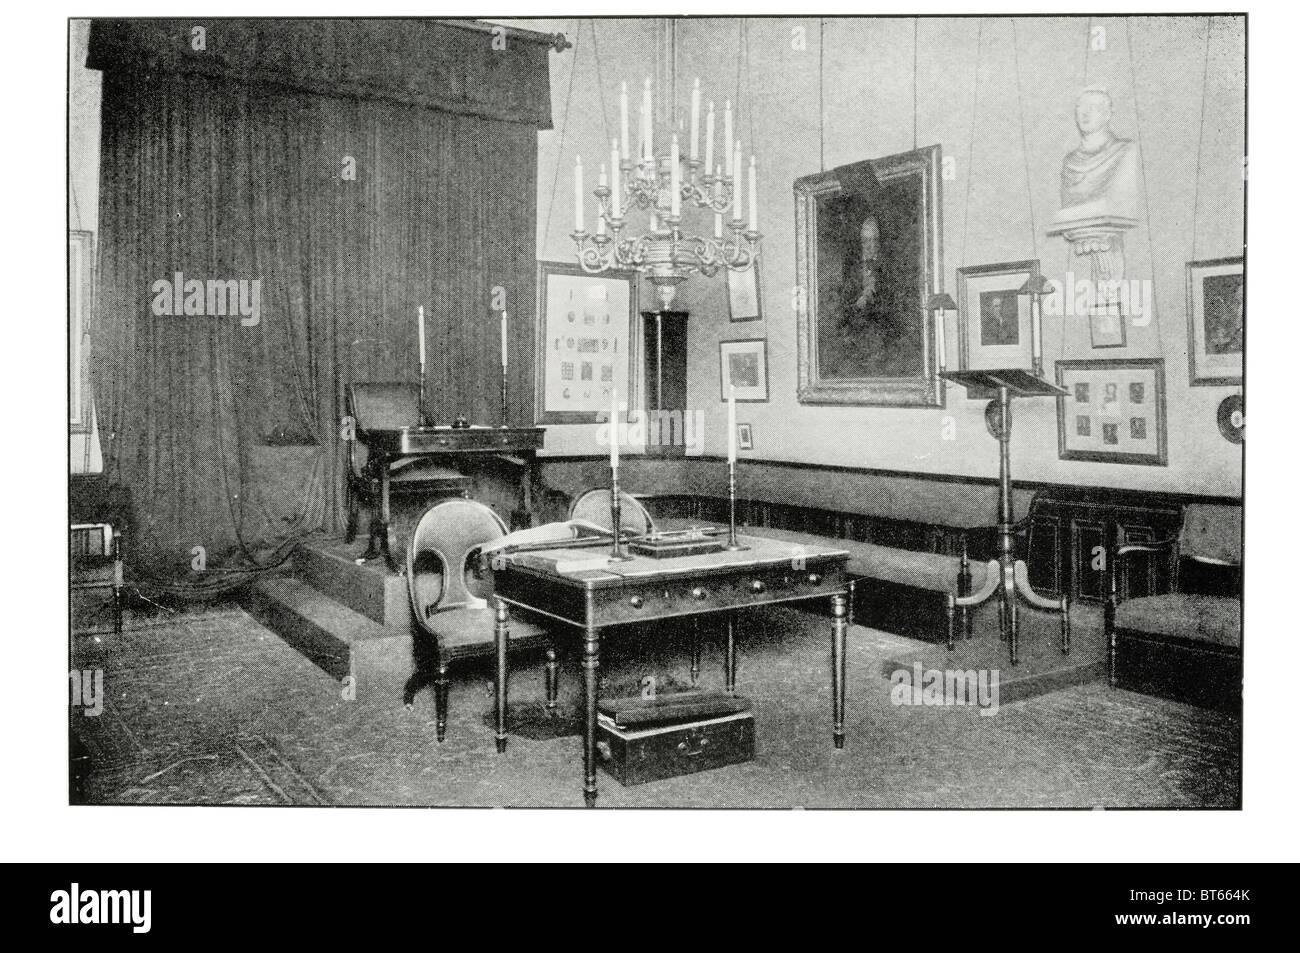 interior inside speculative society inner hall university edinburgh 1868 Scottish Enlightenment society public speaking - Stock Image